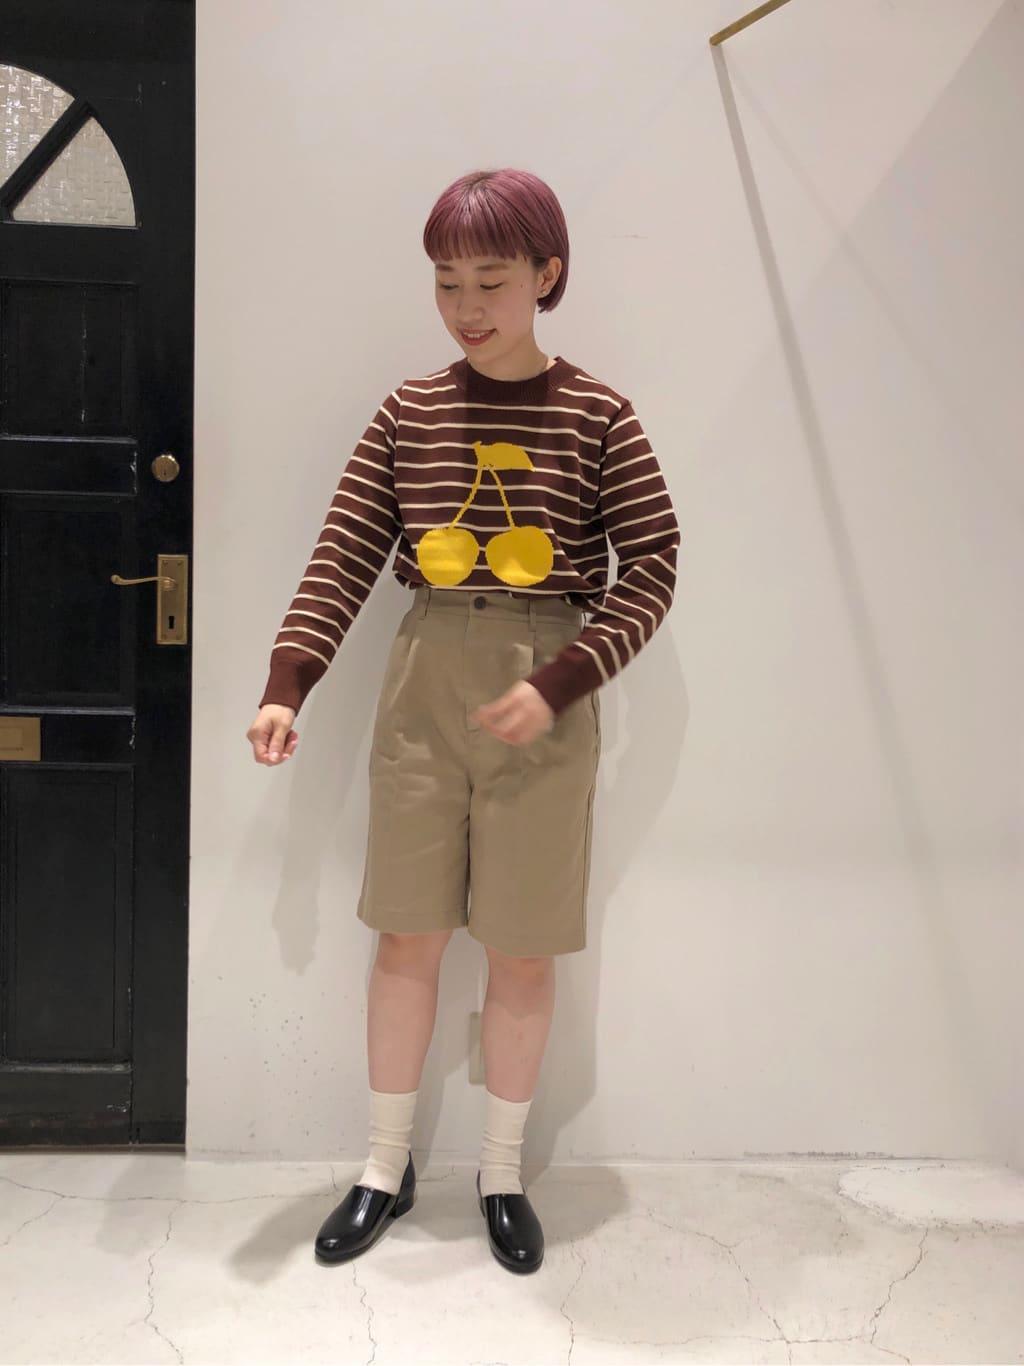 Dot and Stripes CHILD WOMAN ルクアイーレ 身長:157cm 2021.09.02